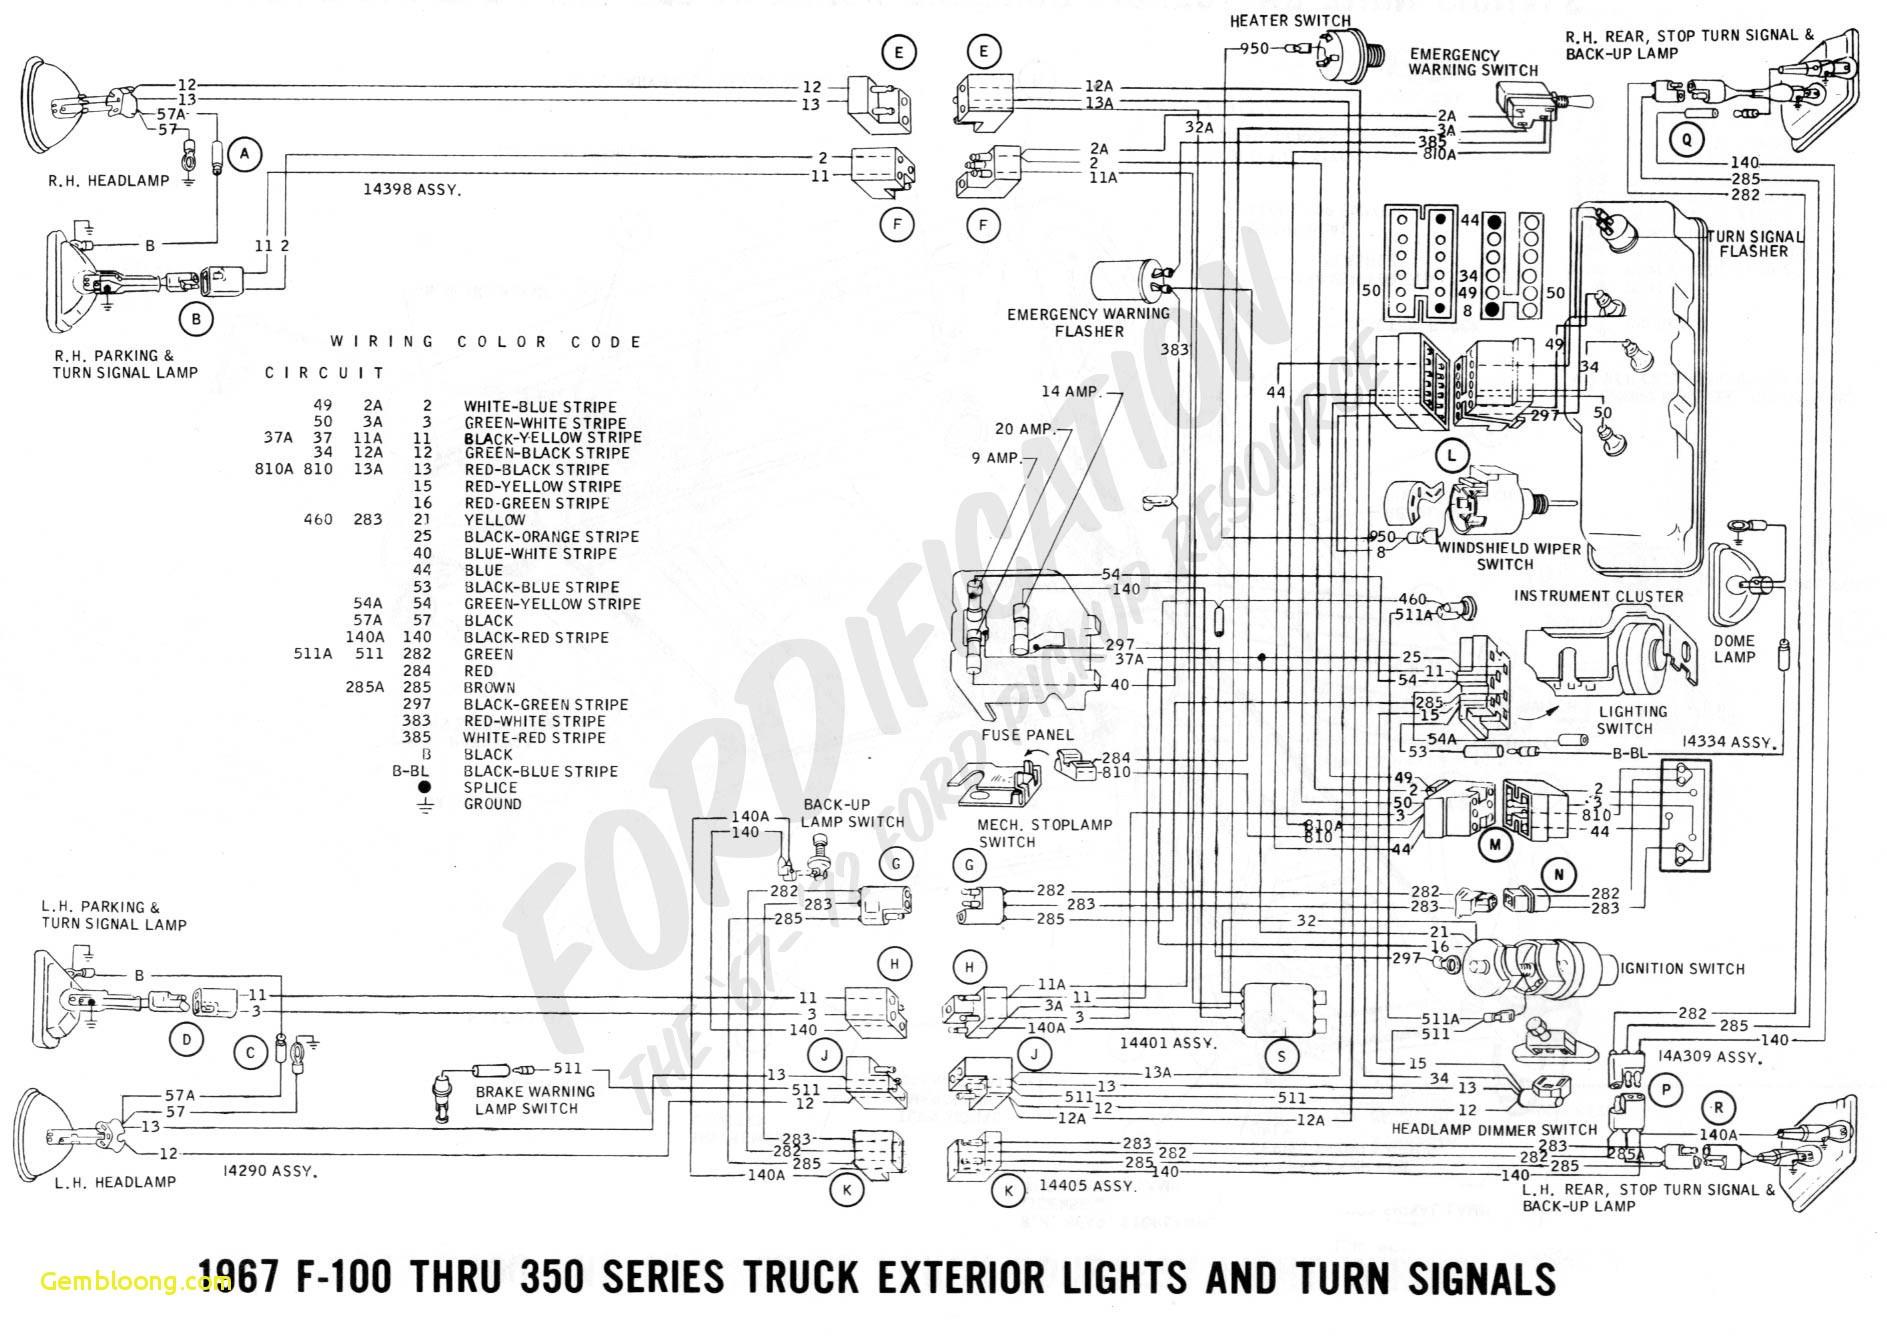 Truck Drivetrain Diagram Download ford Trucks Wiring Diagrams ford F150 Wiring Diagrams Best Of Truck Drivetrain Diagram